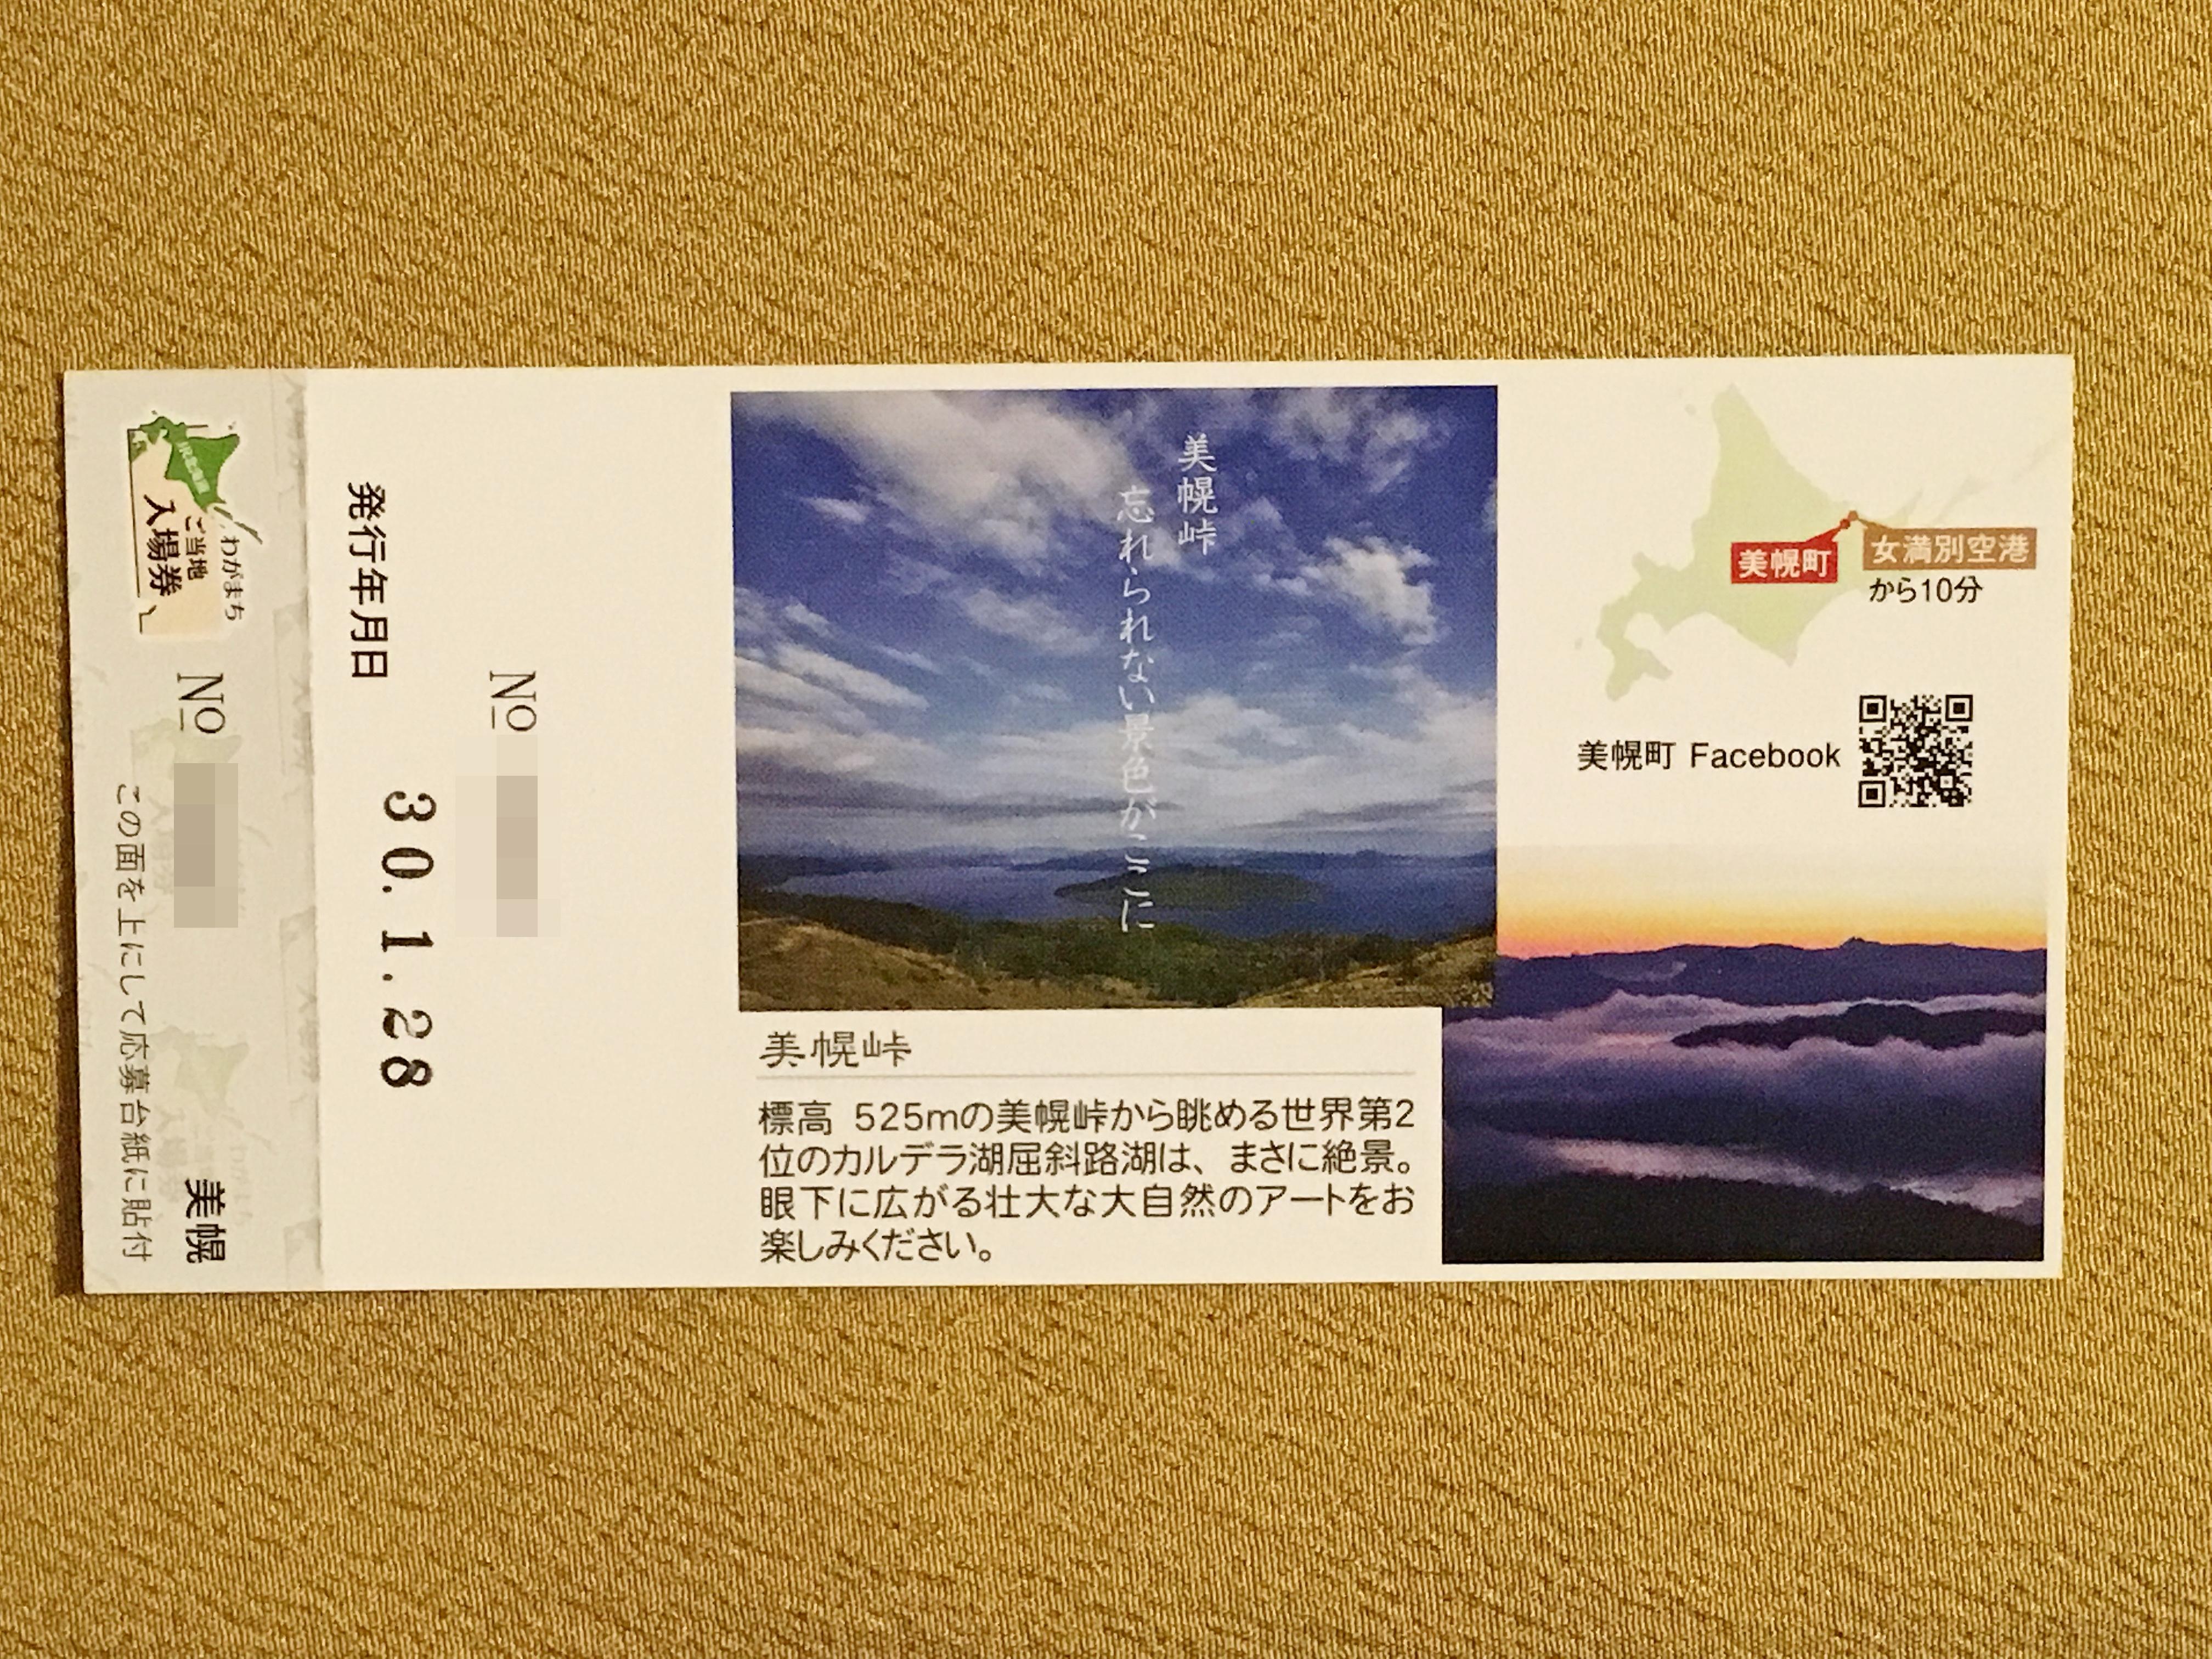 JR北海道ご当地入場券  美幌駅裏.JPG